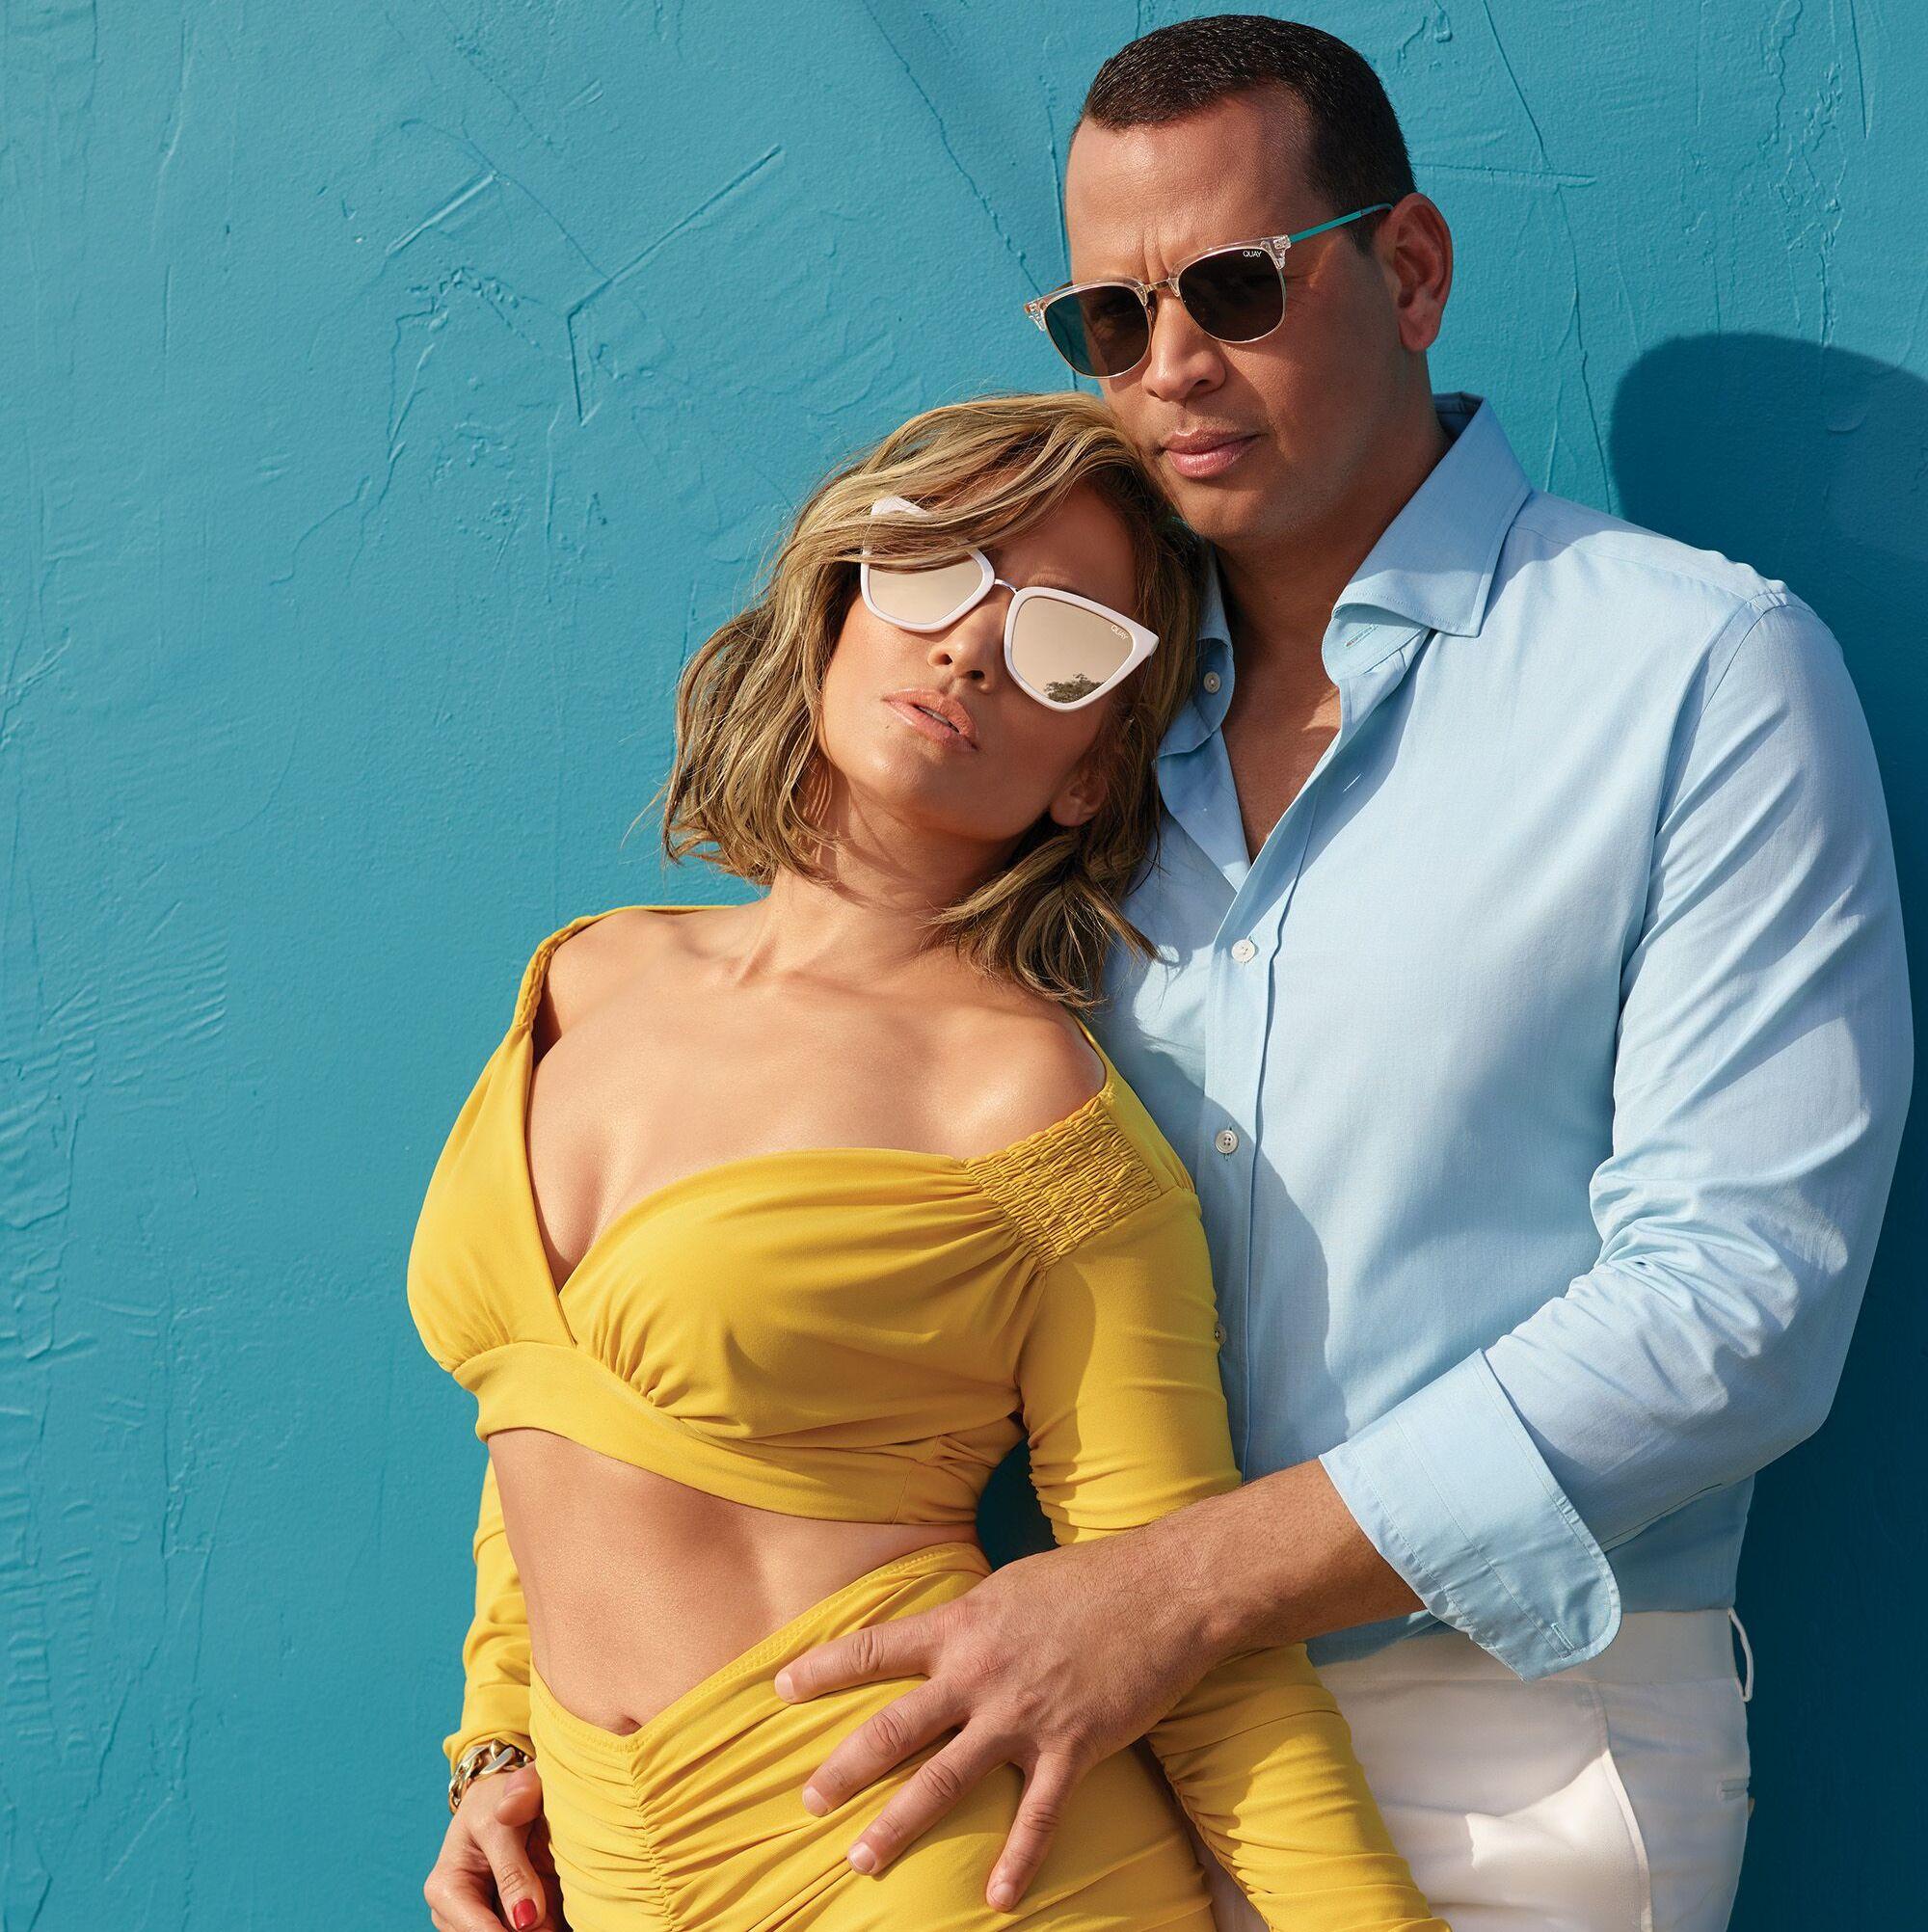 Jennifer Lopez and Alex Rodriguez's Sunglasses Campaign Is Stunning